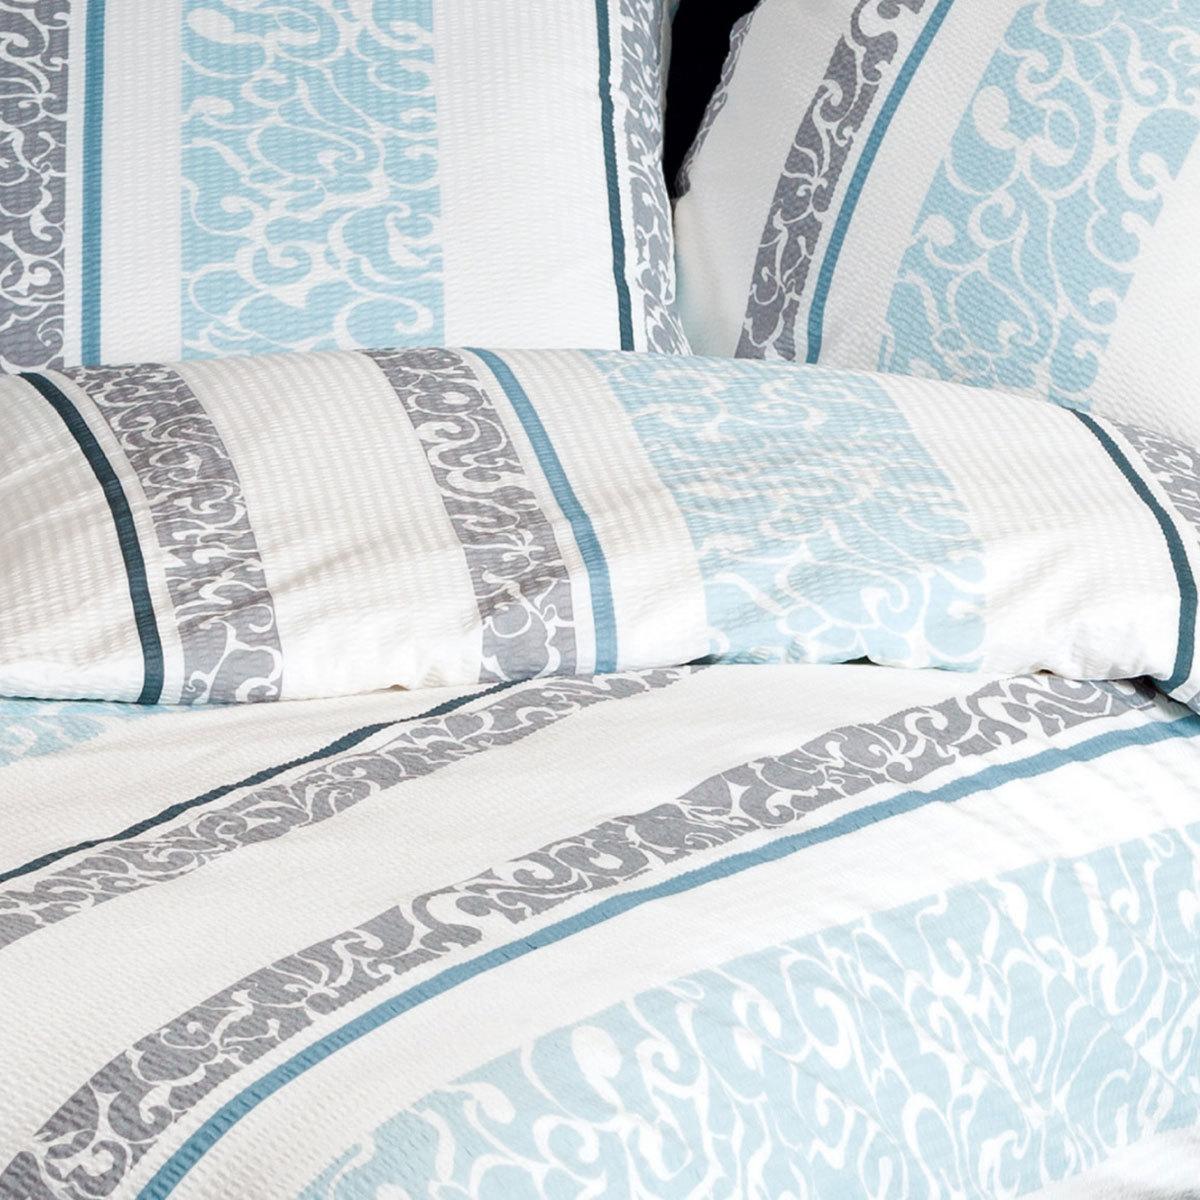 janine seersucker bettw sche tango 20046 02 blau platin g nstig online kaufen bei bettwaren shop. Black Bedroom Furniture Sets. Home Design Ideas